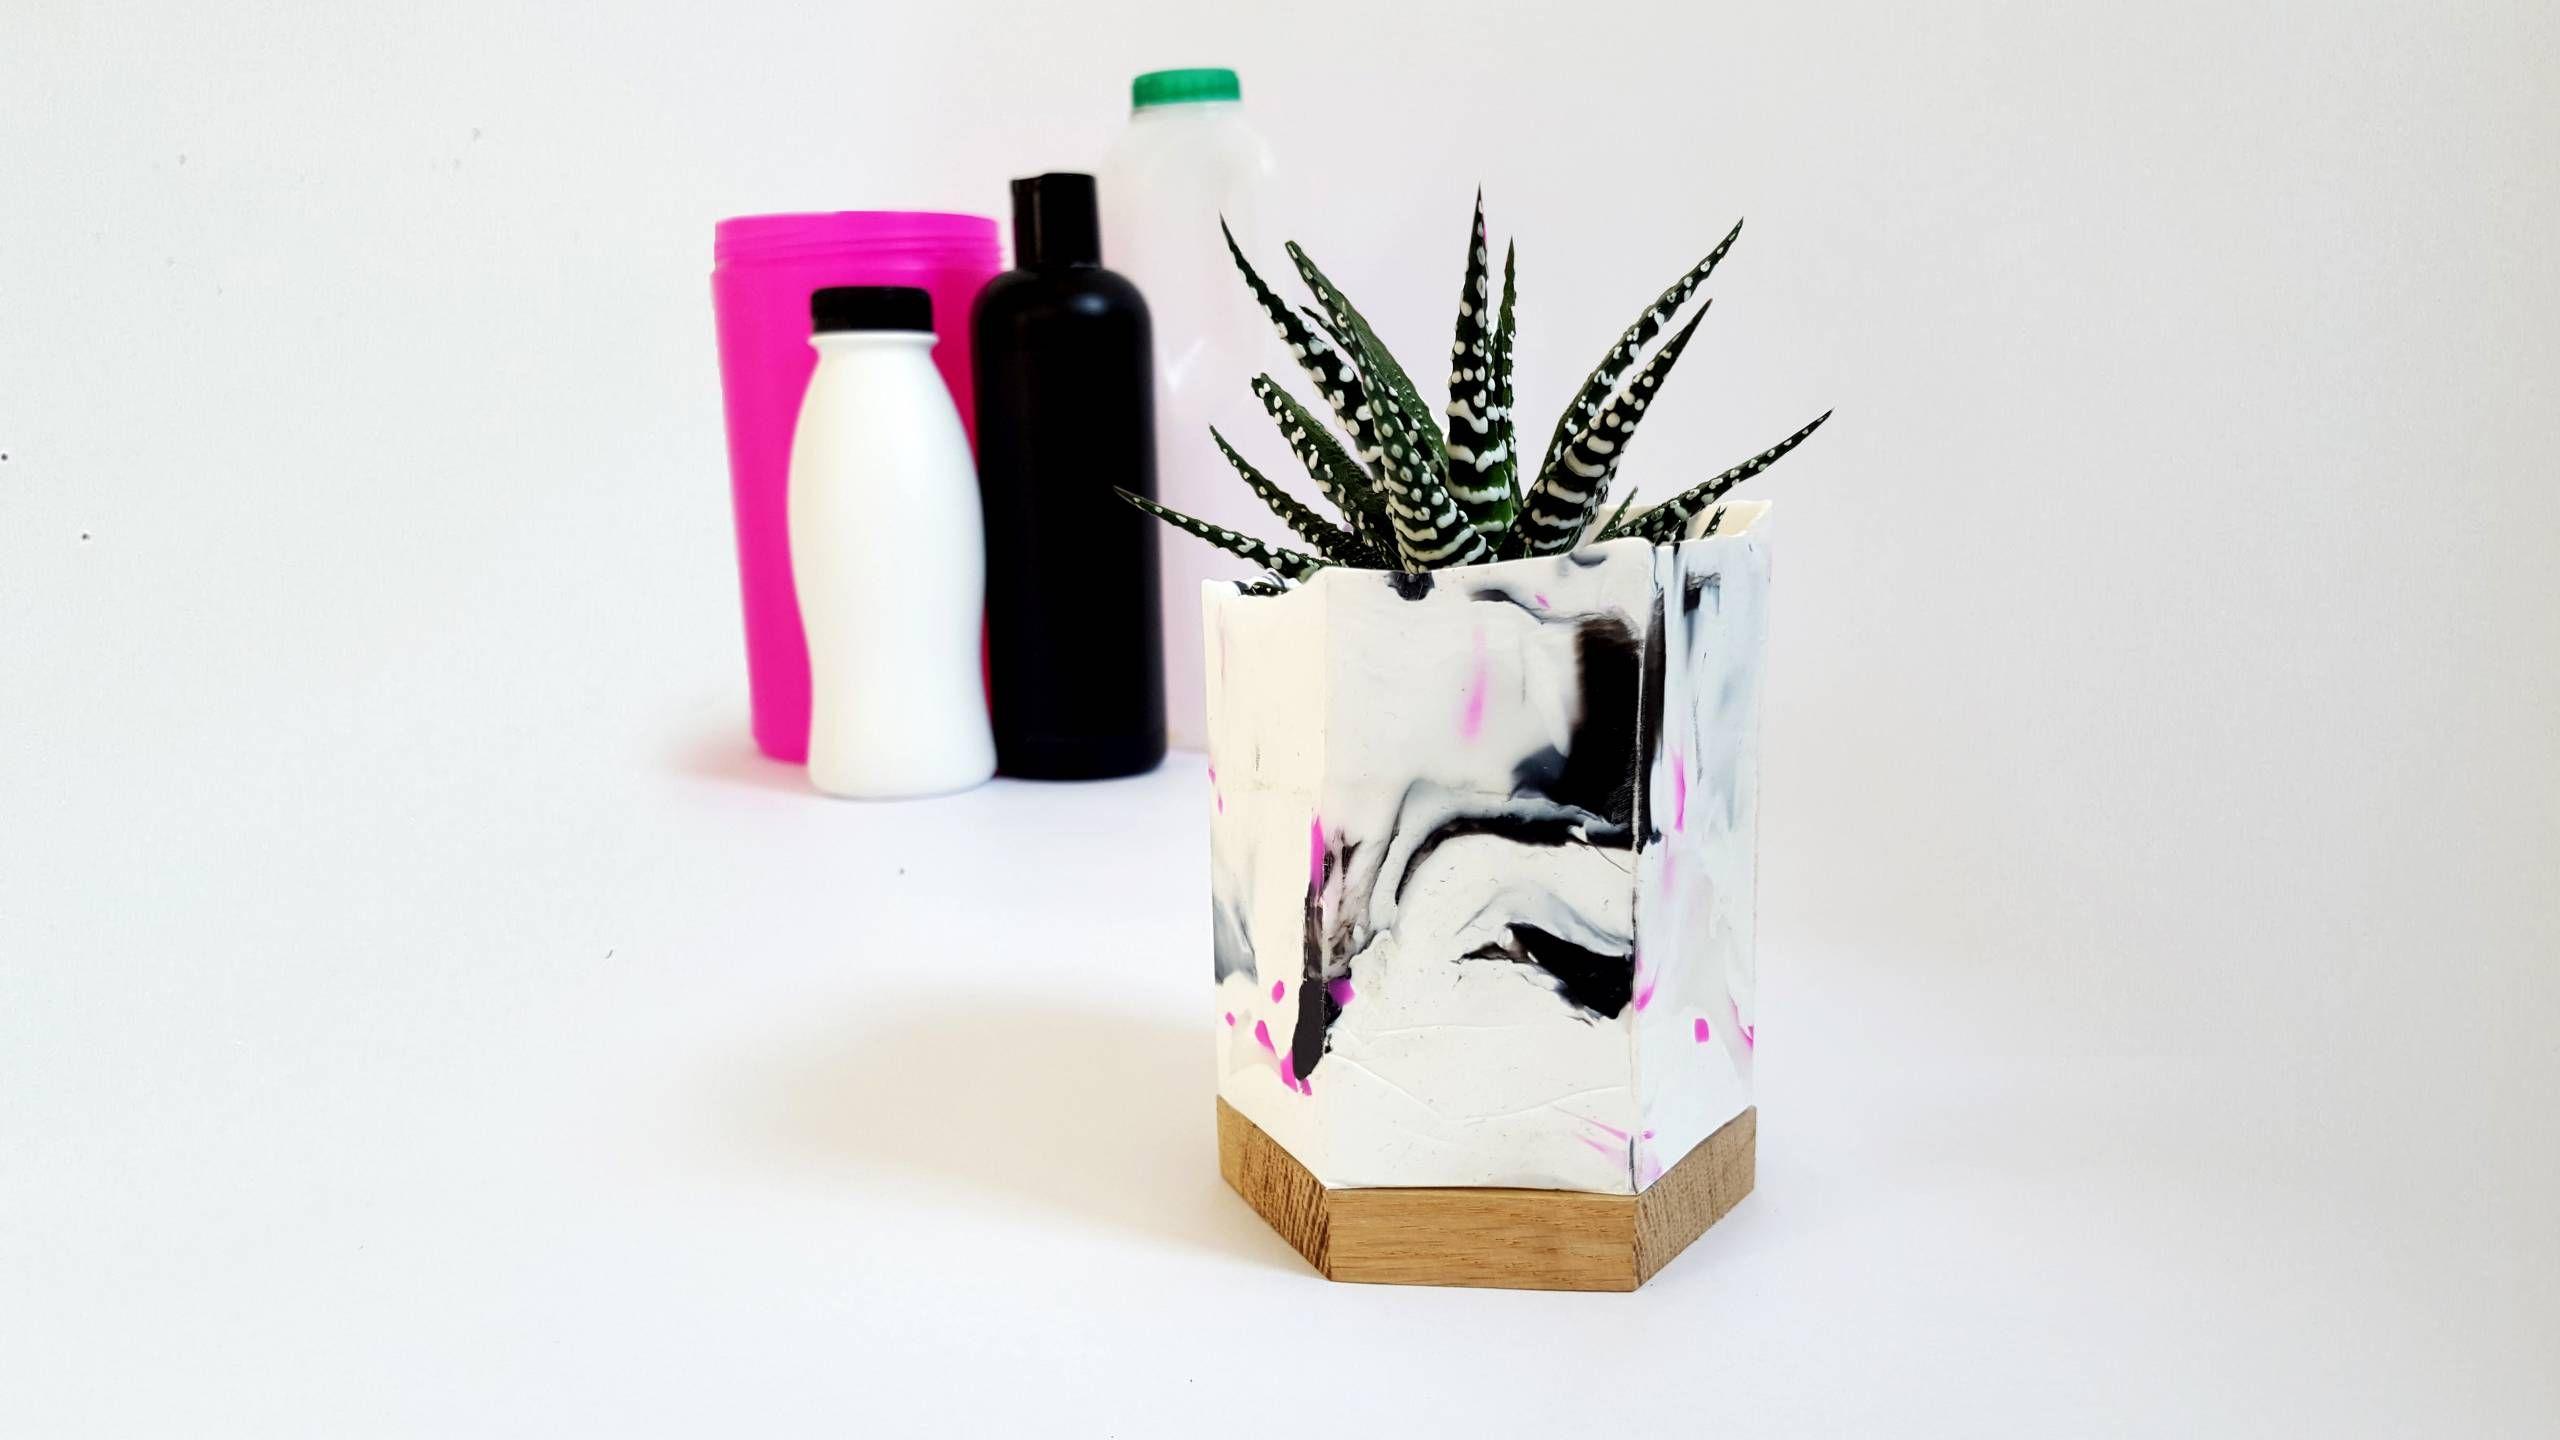 melt Recycle plastic bottles, Plastic design, Melted plastic